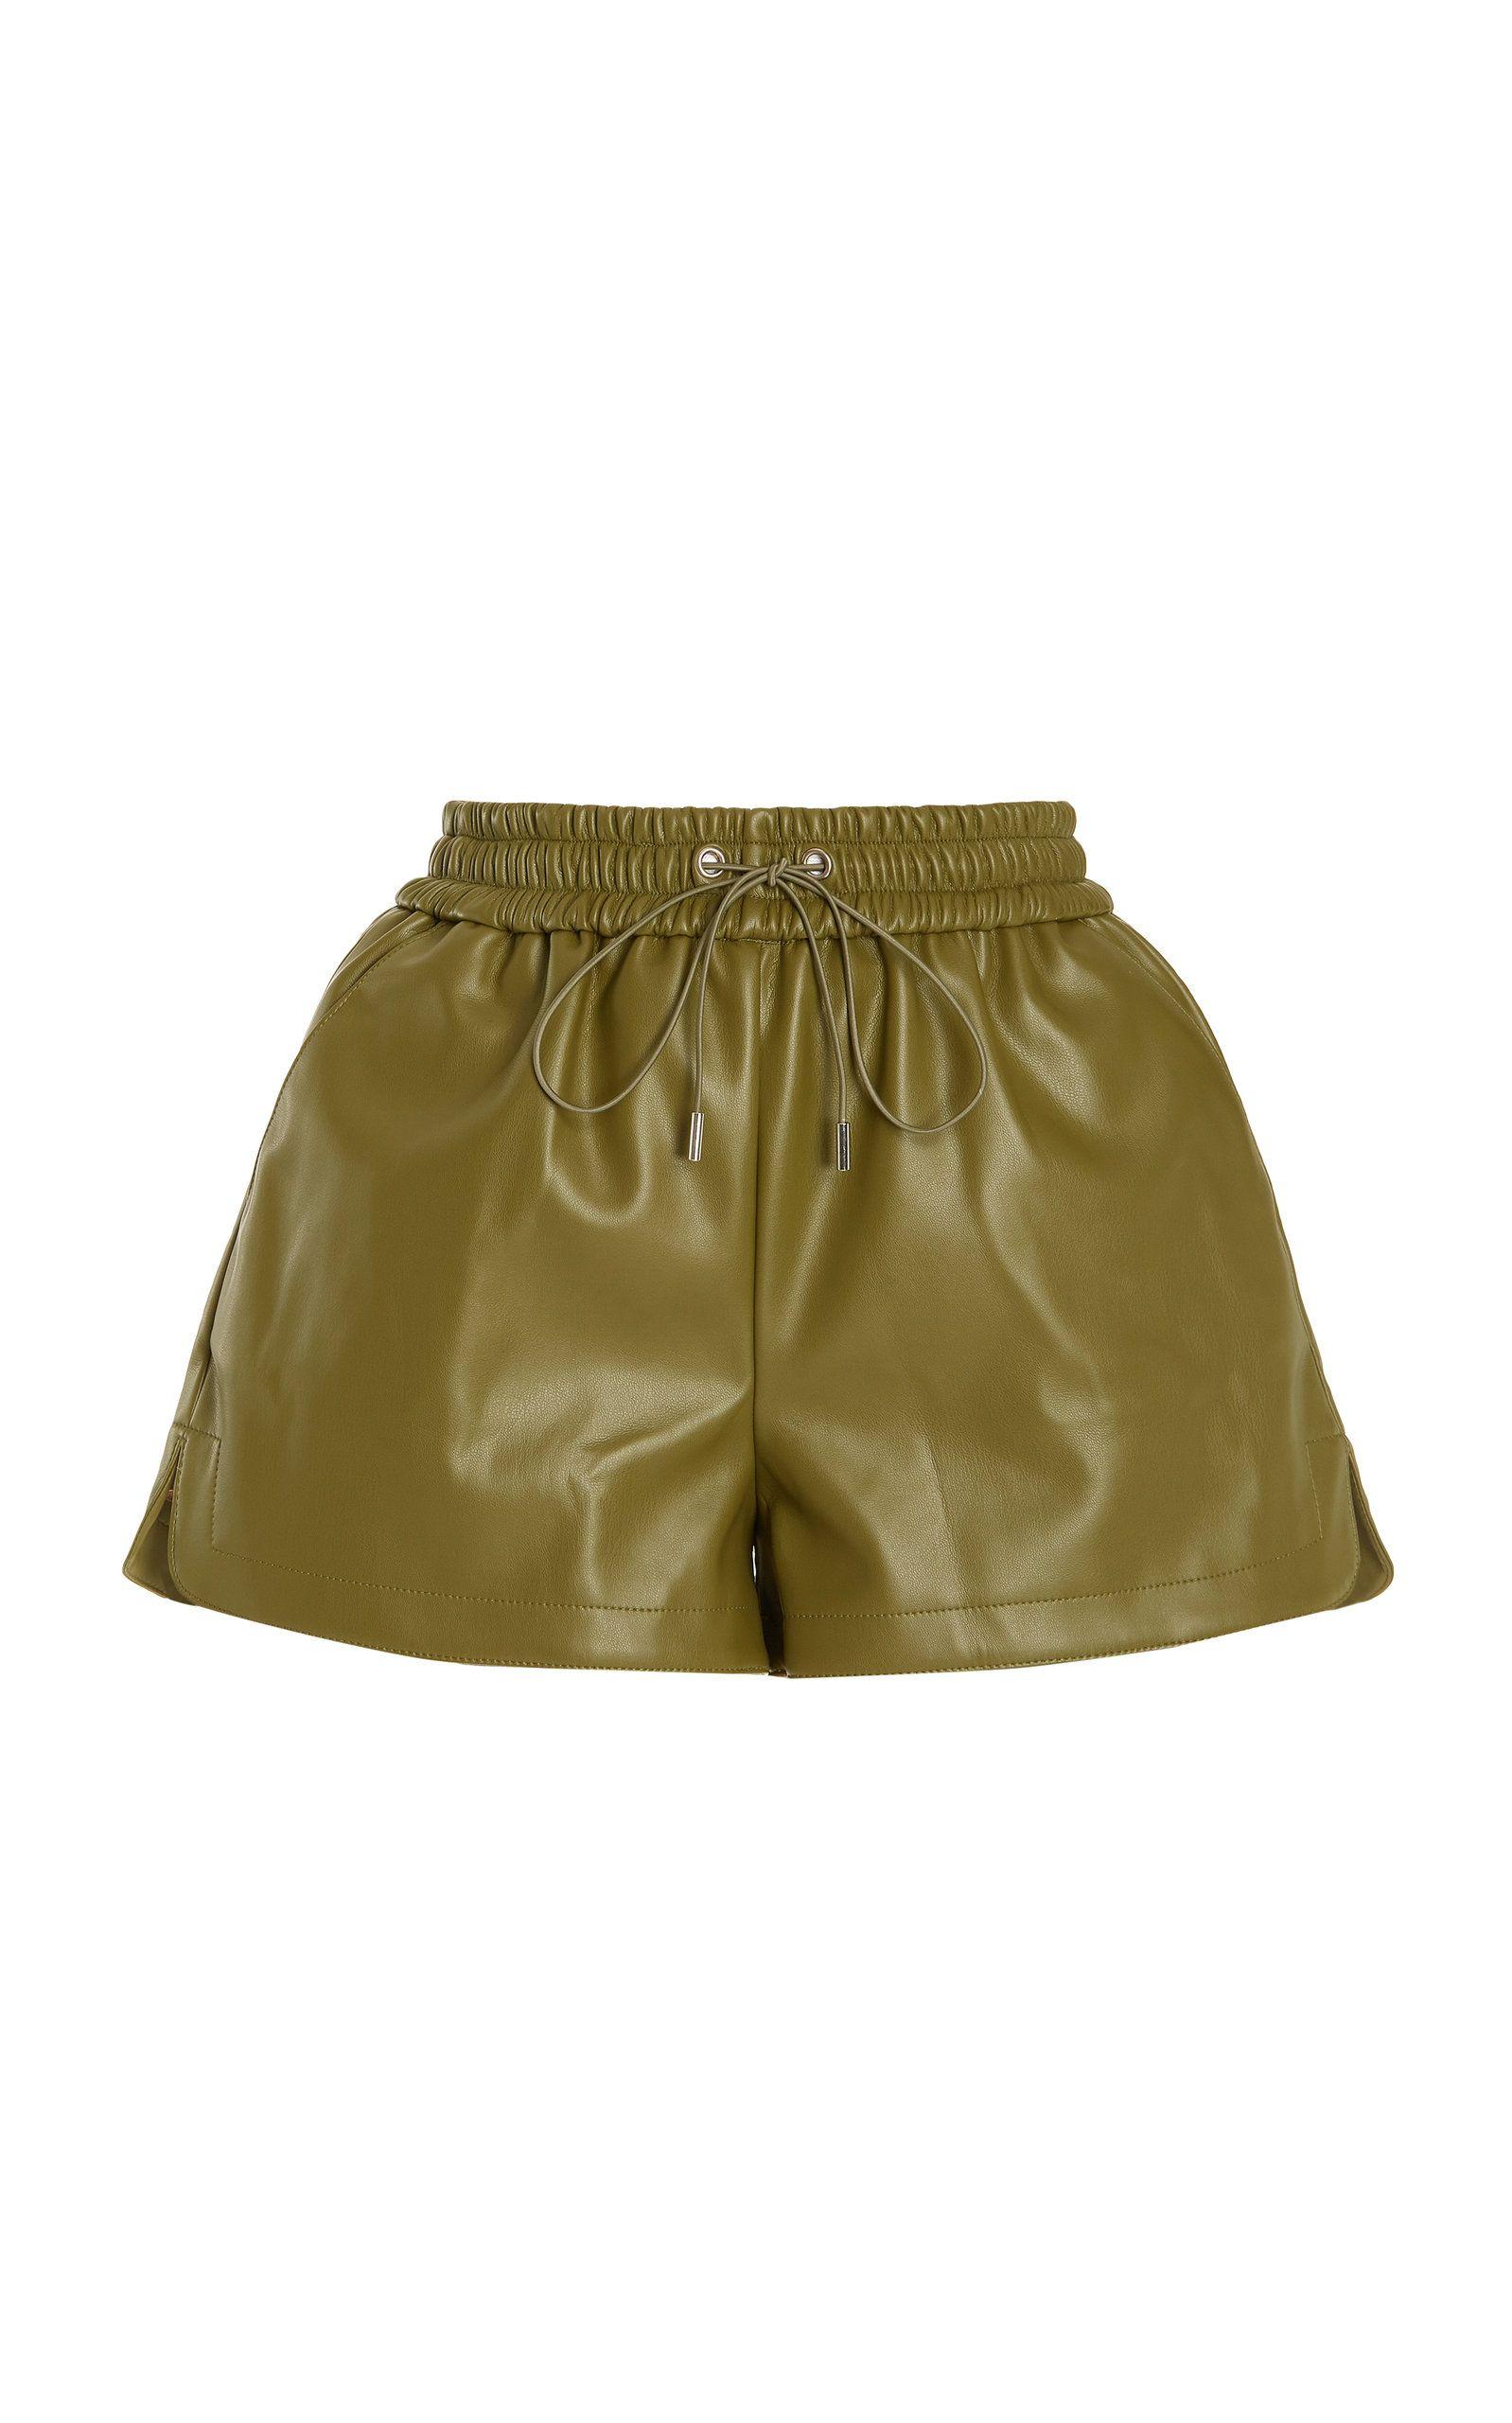 best new fashion items 286246 1629963367118